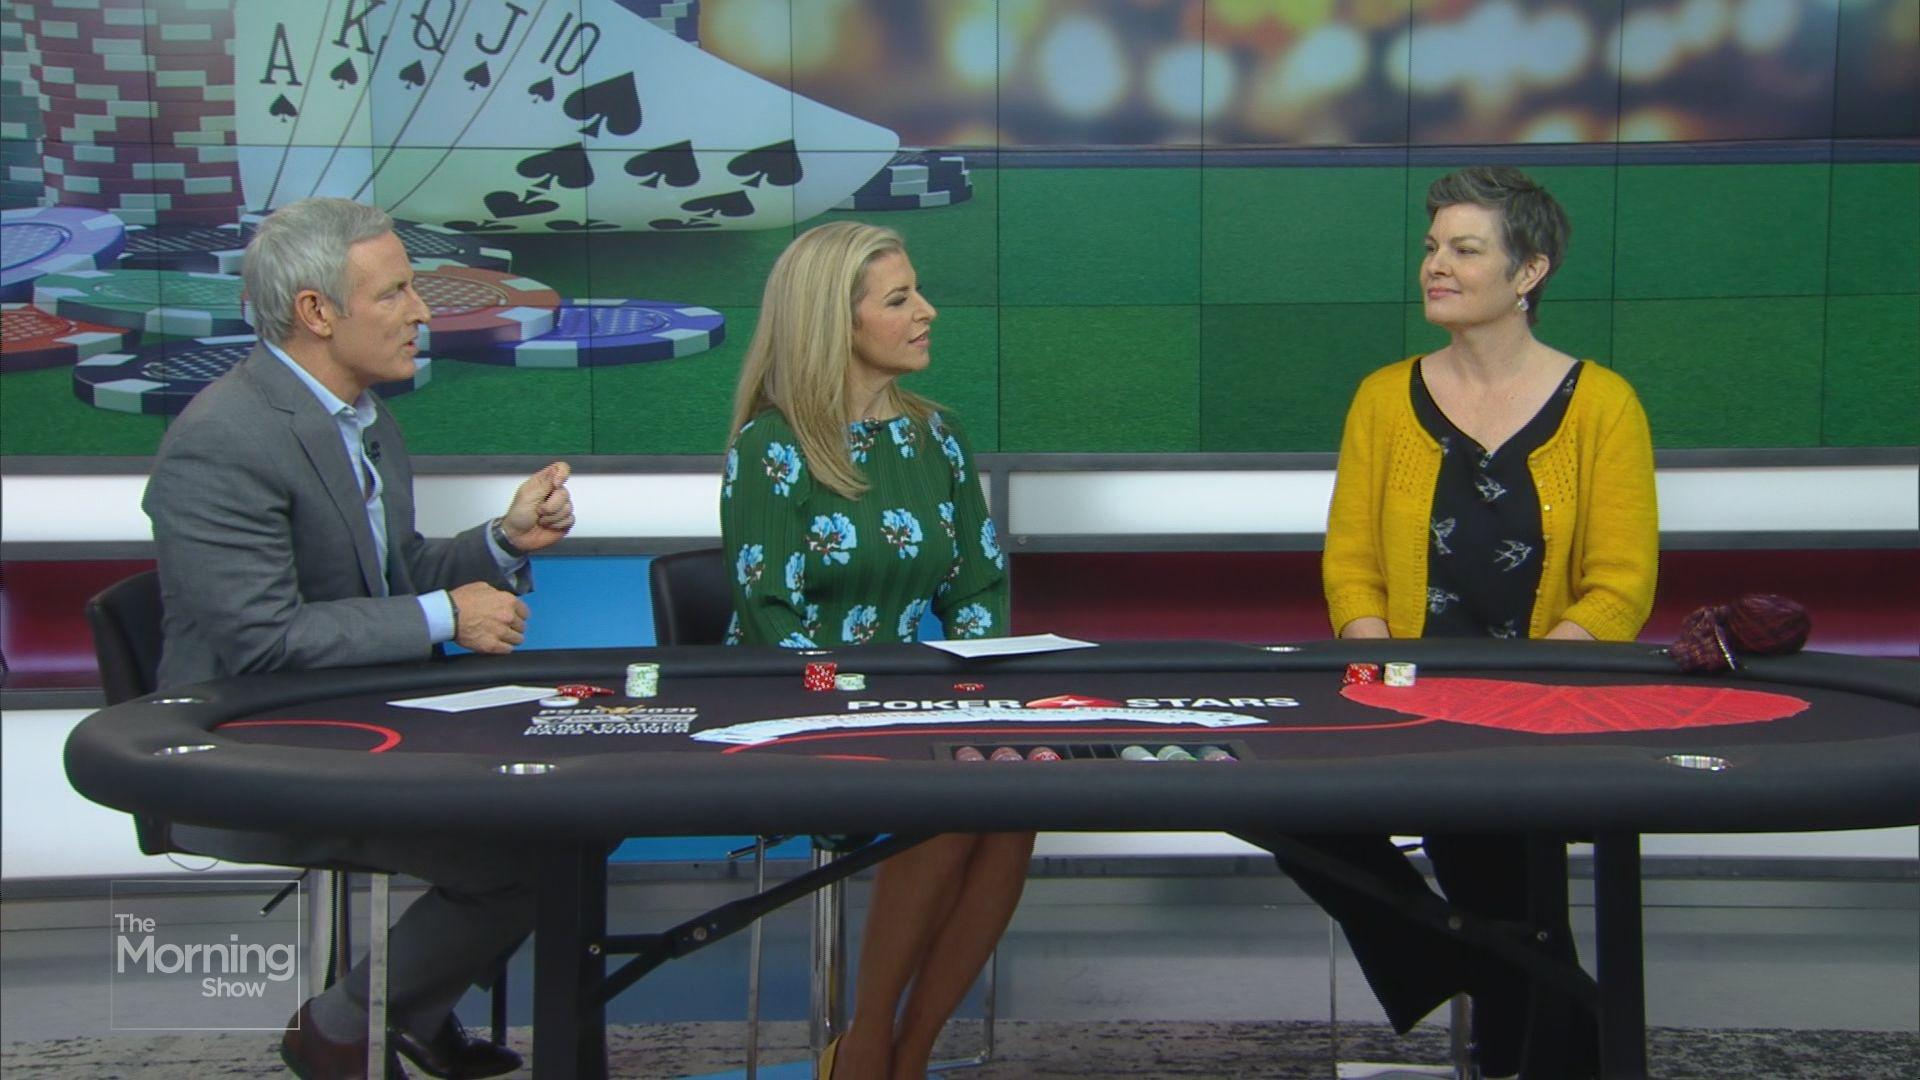 Poker star Jennifer Carter shares tips on perfecting your 'poker face'